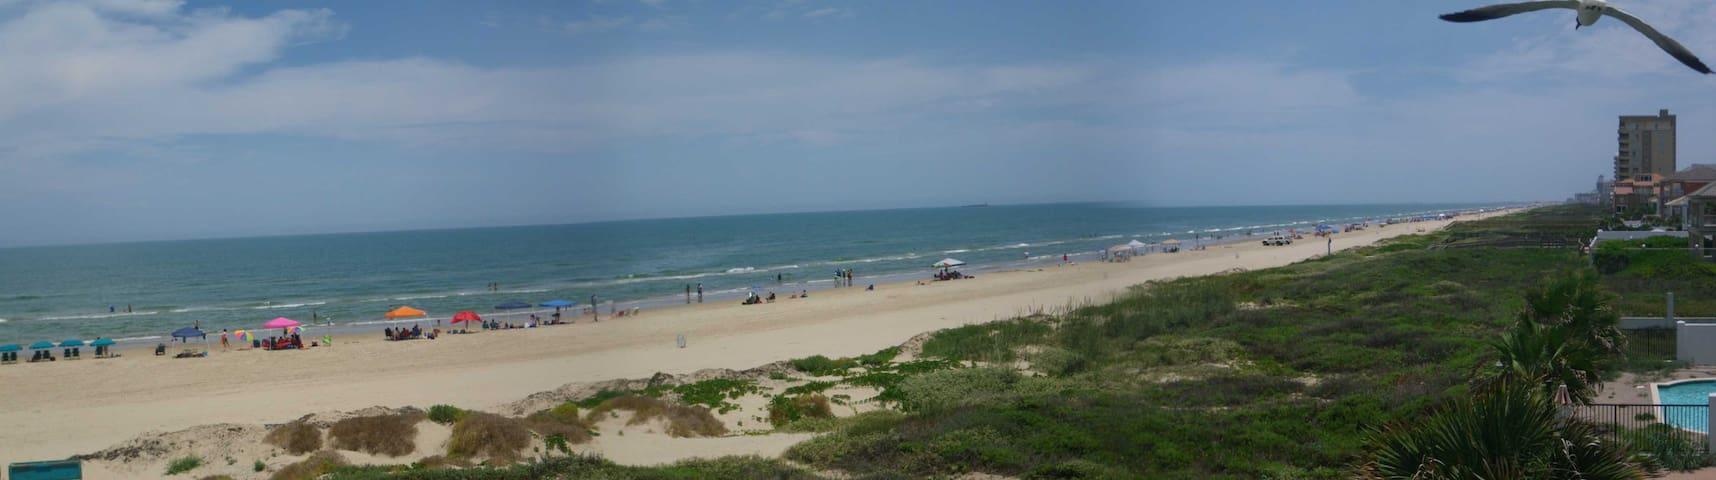 Beach Front Condo  - South Padre Island - Lägenhet